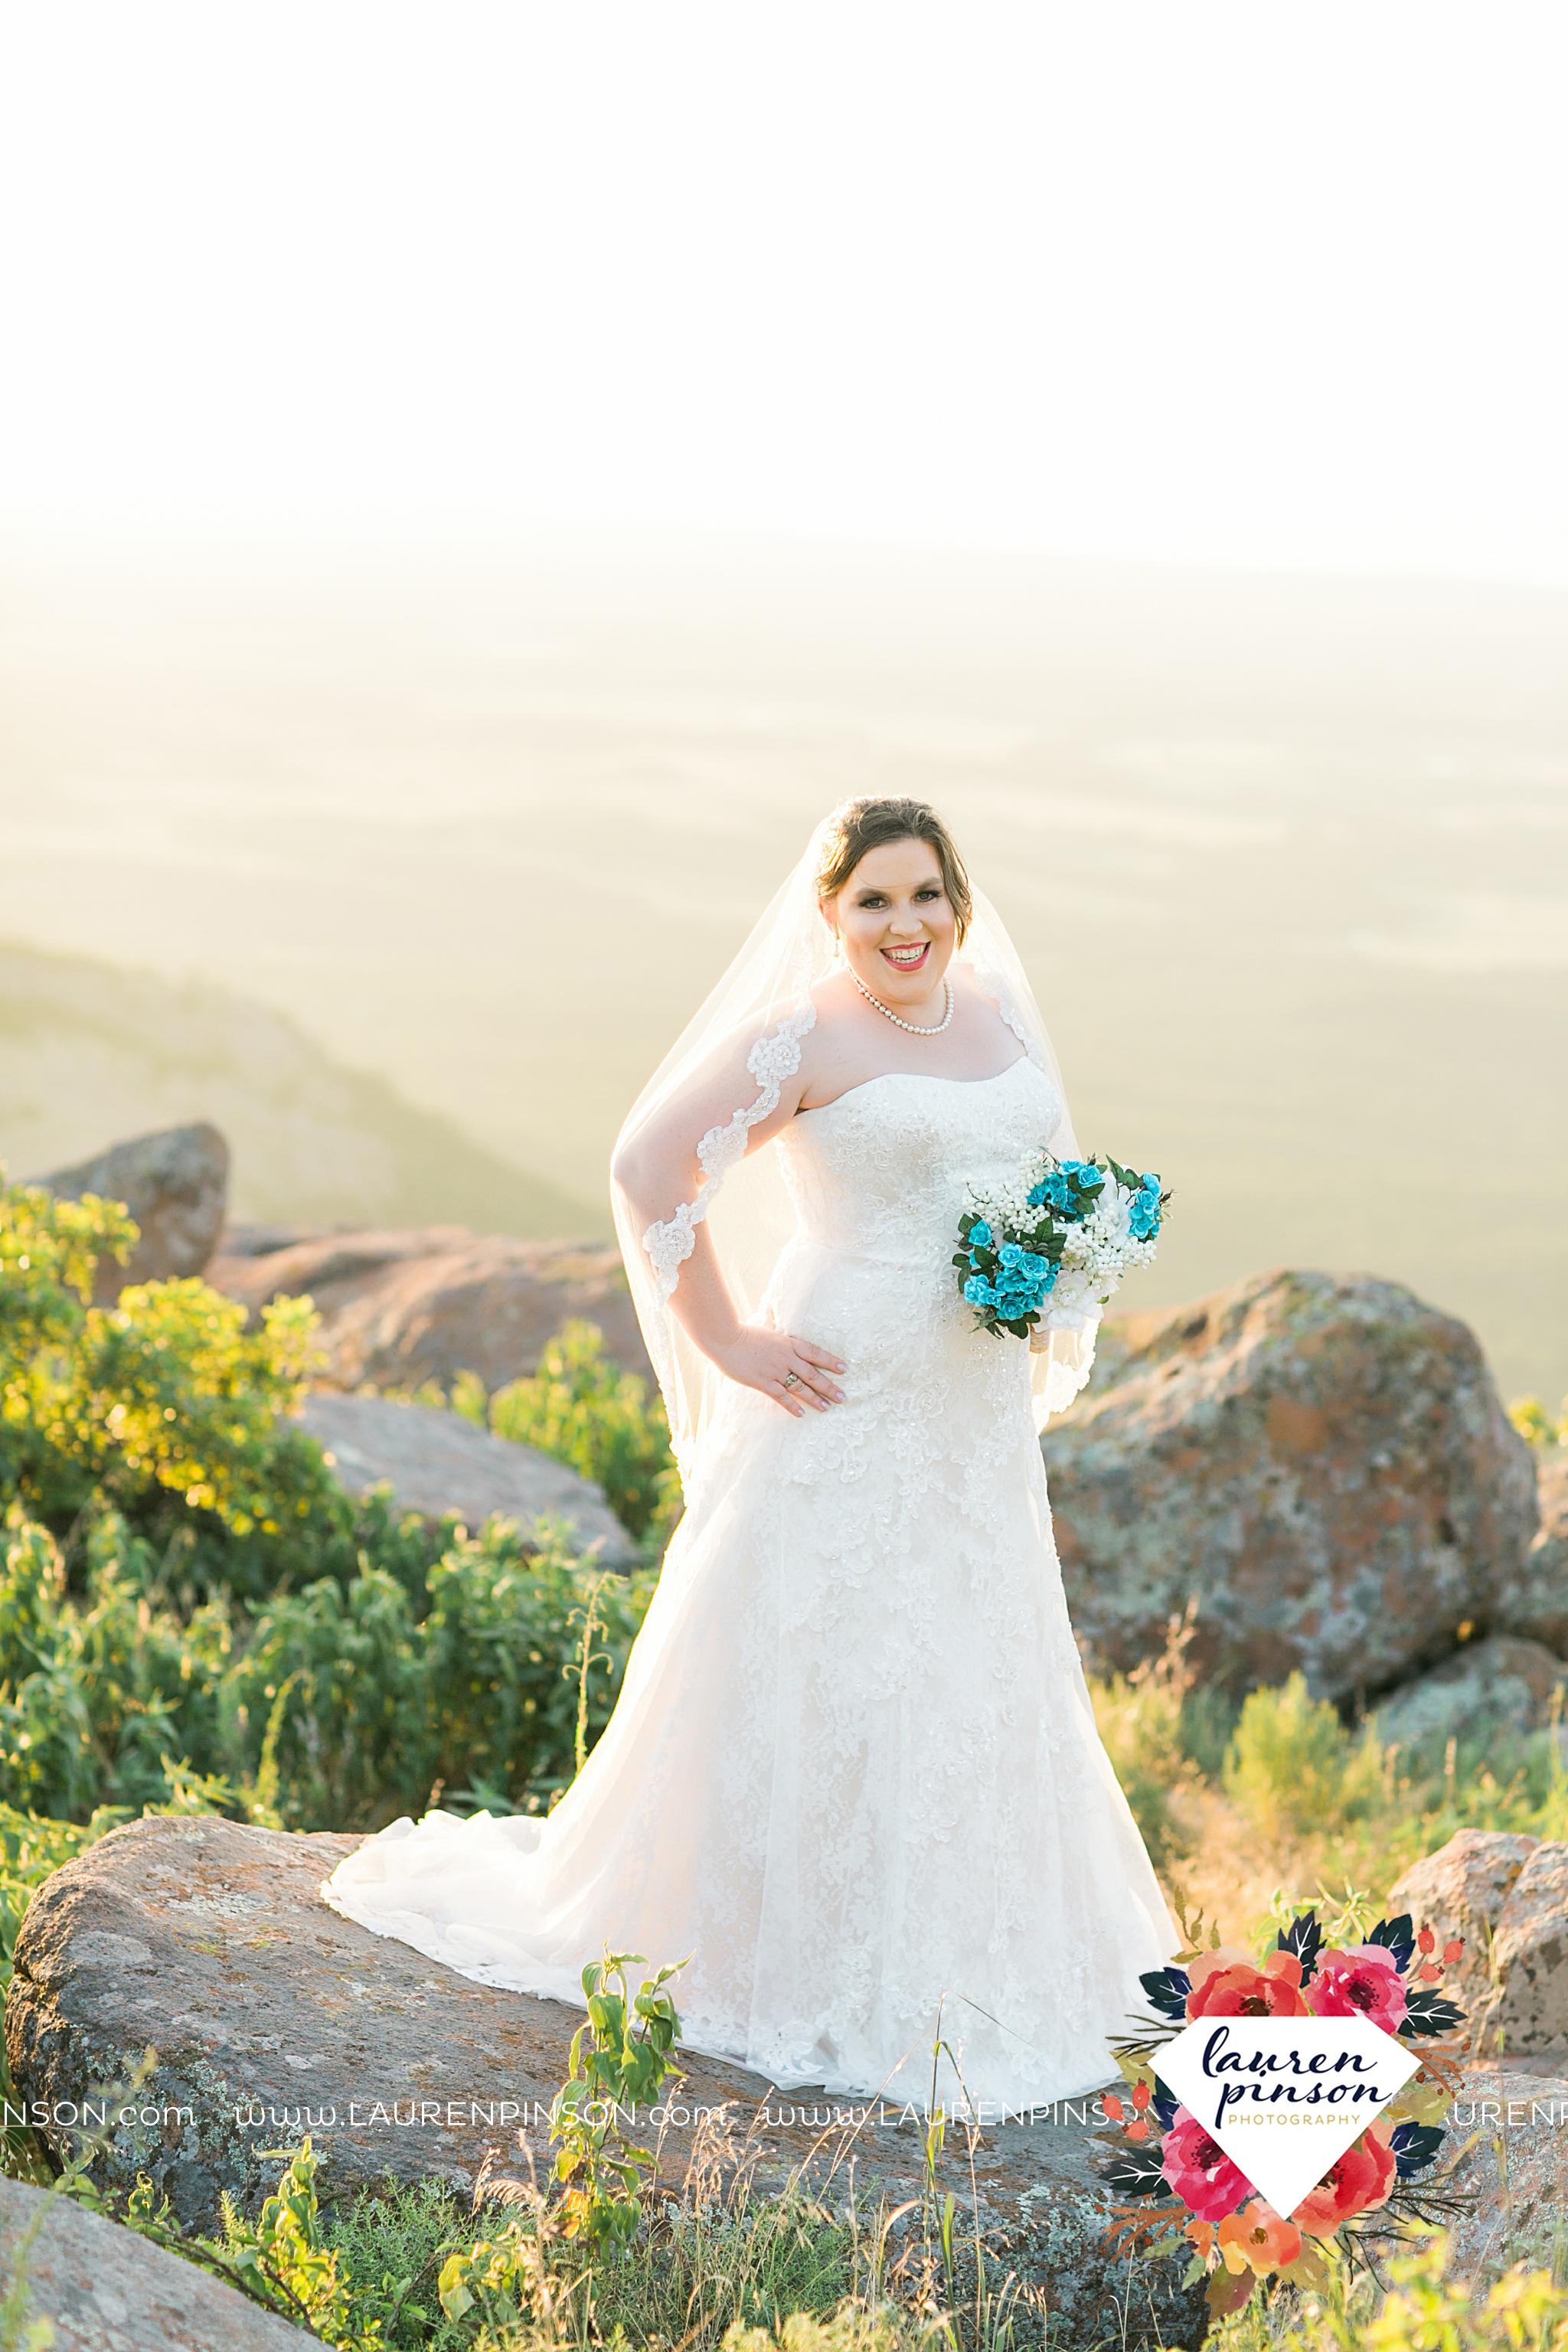 wichita-falls-texas-walters-lawton-oklahoma-wedding-photographer-wichita-mountains-bridal-portraits_3177.jpg